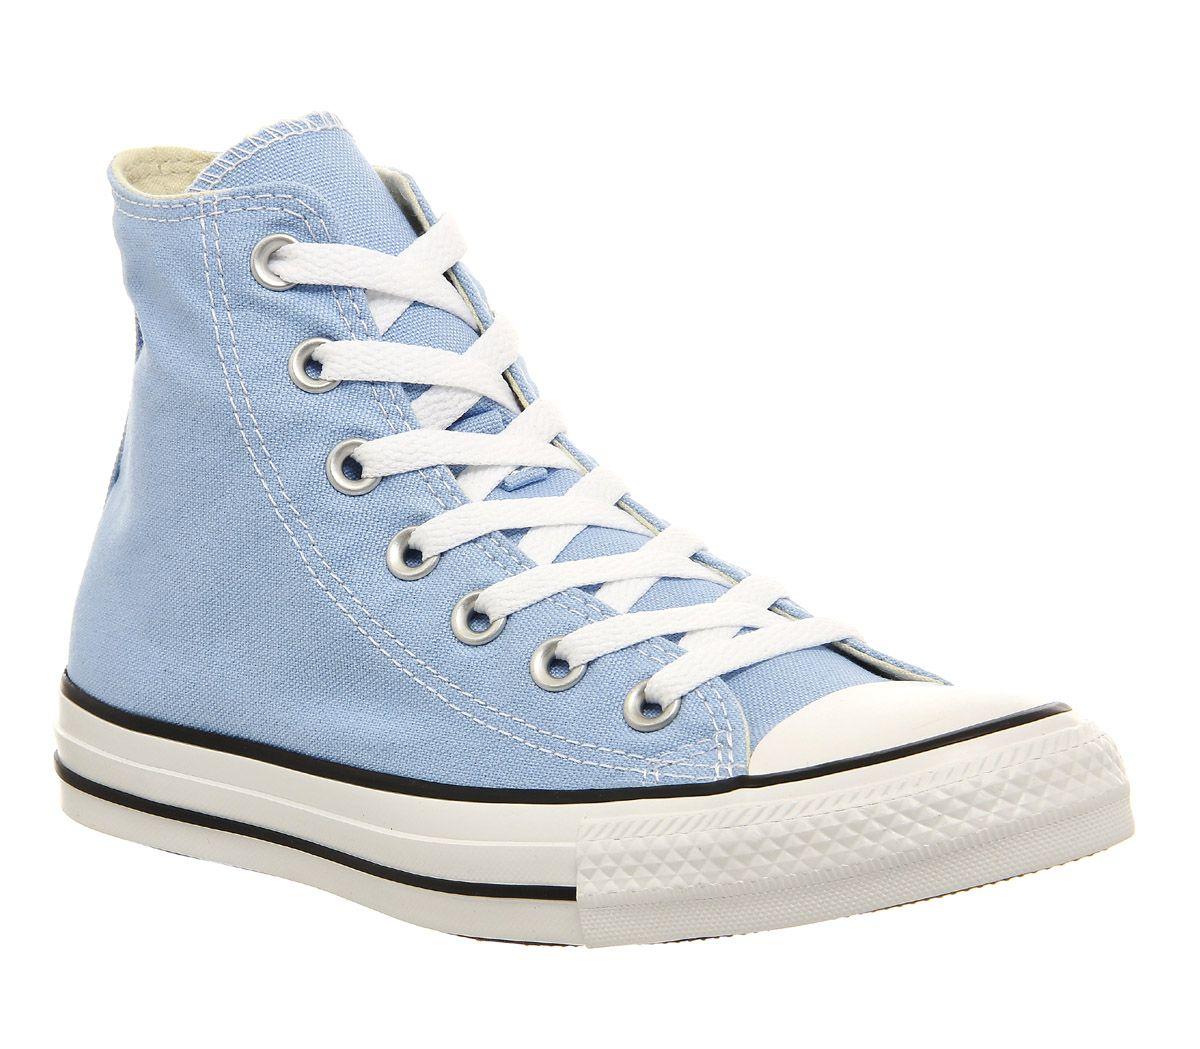 Converse Sneakers All Star Hi Blue Sky